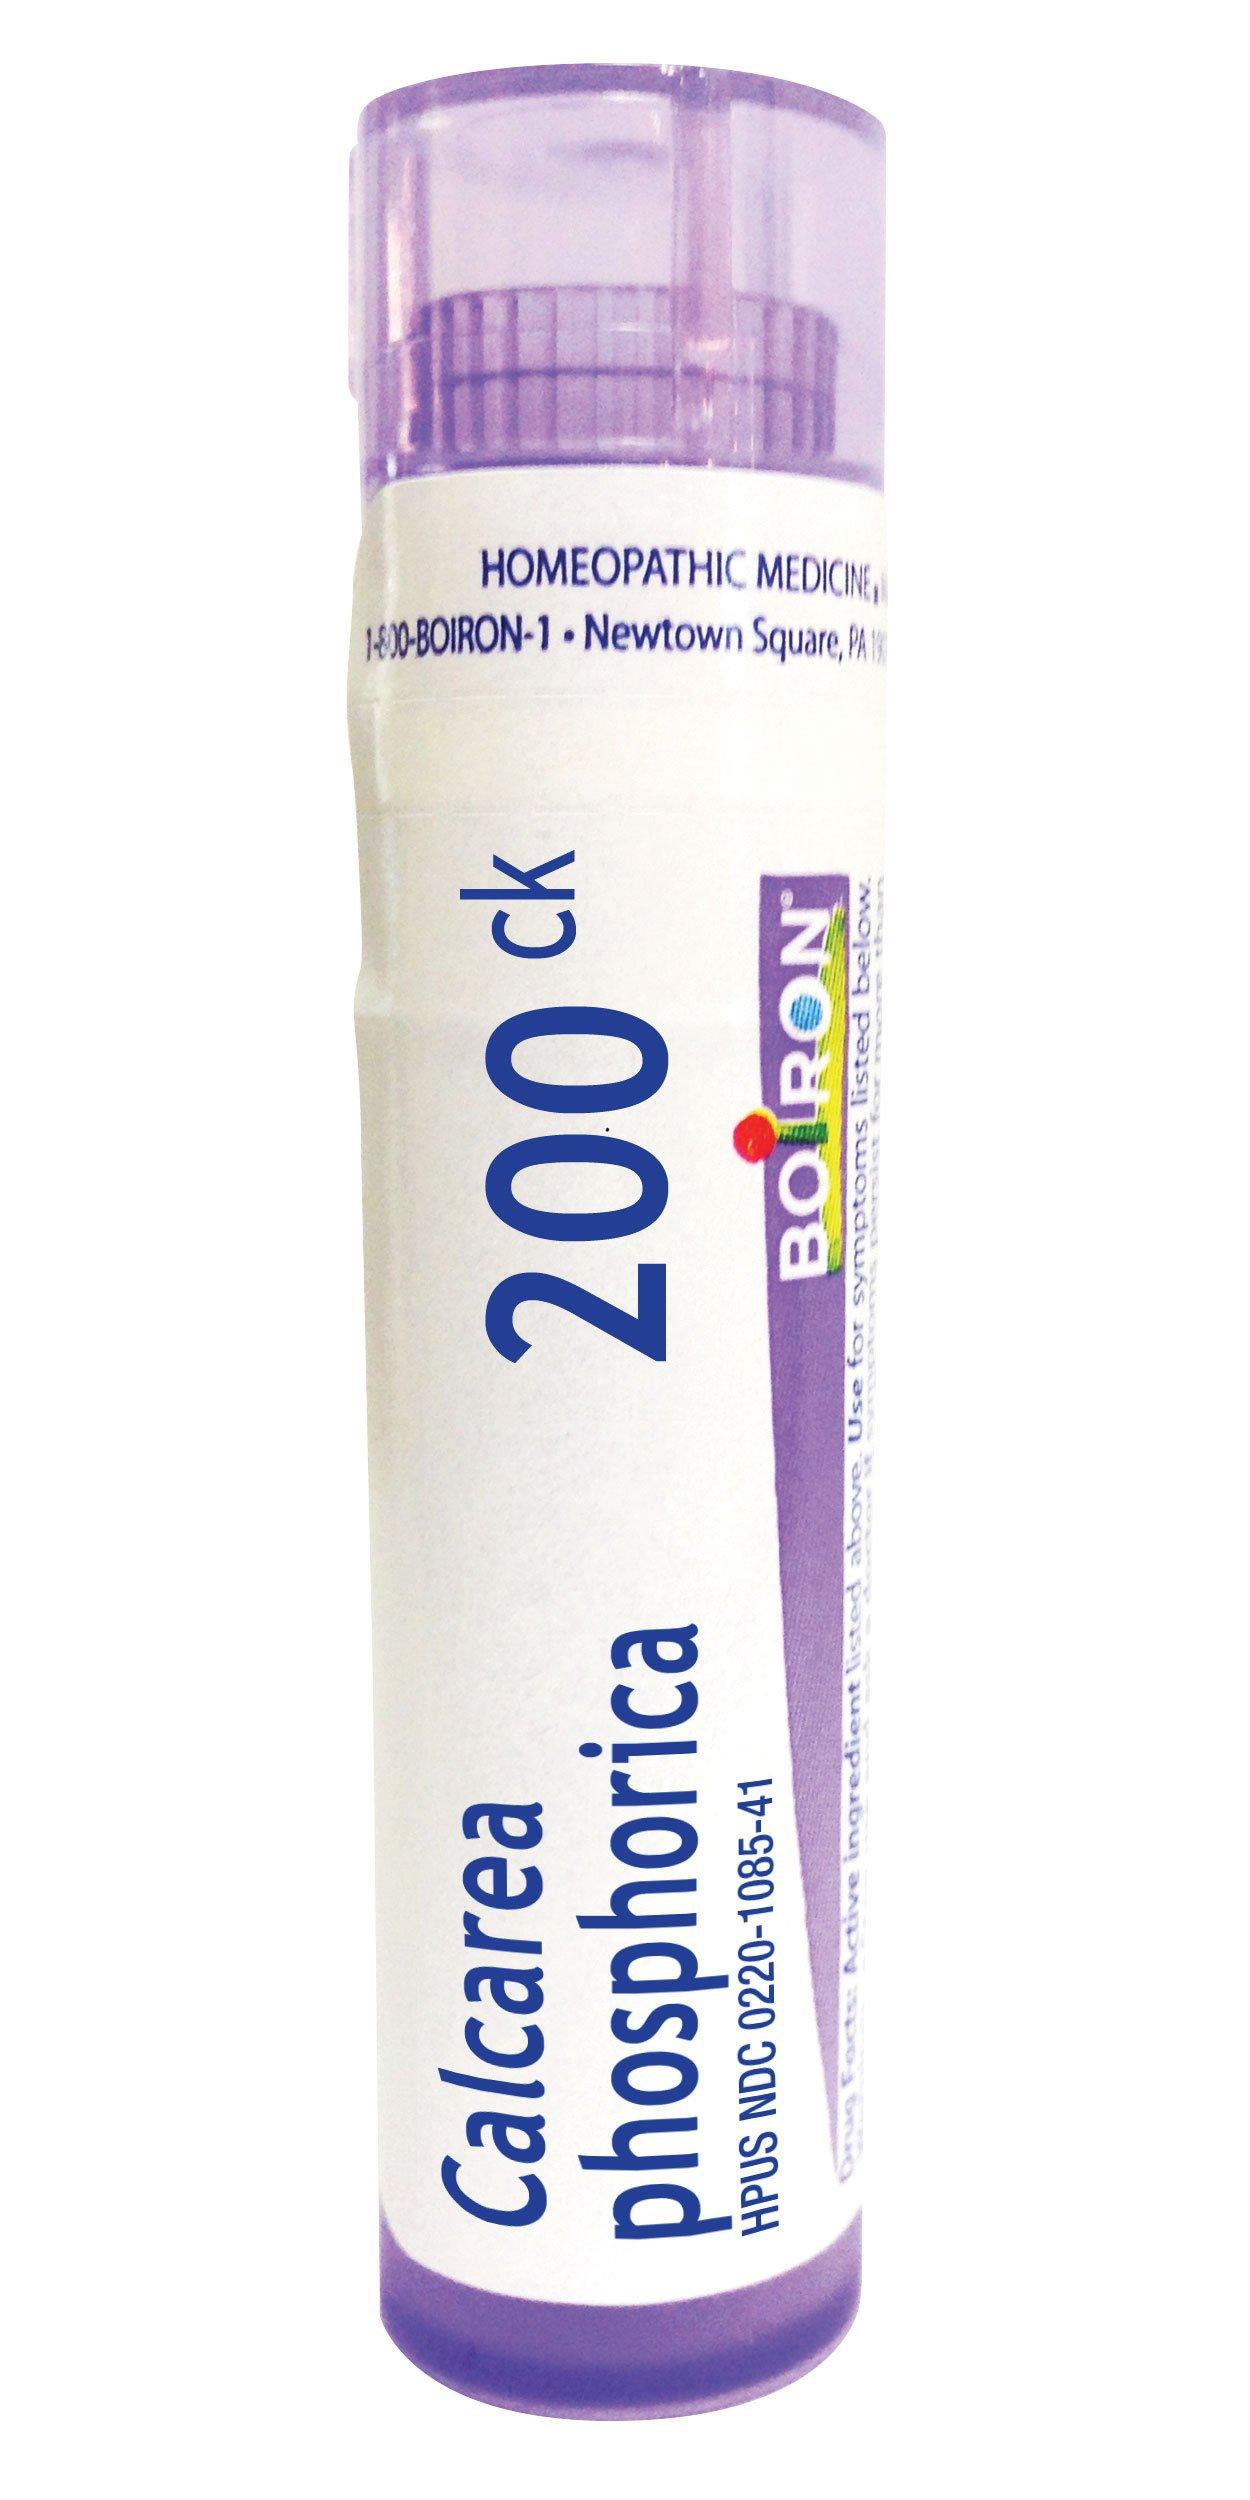 Boiron Calcarea Phosphorica 200C, 80 Pellets, Homeopathic Medicine for Growing Pains